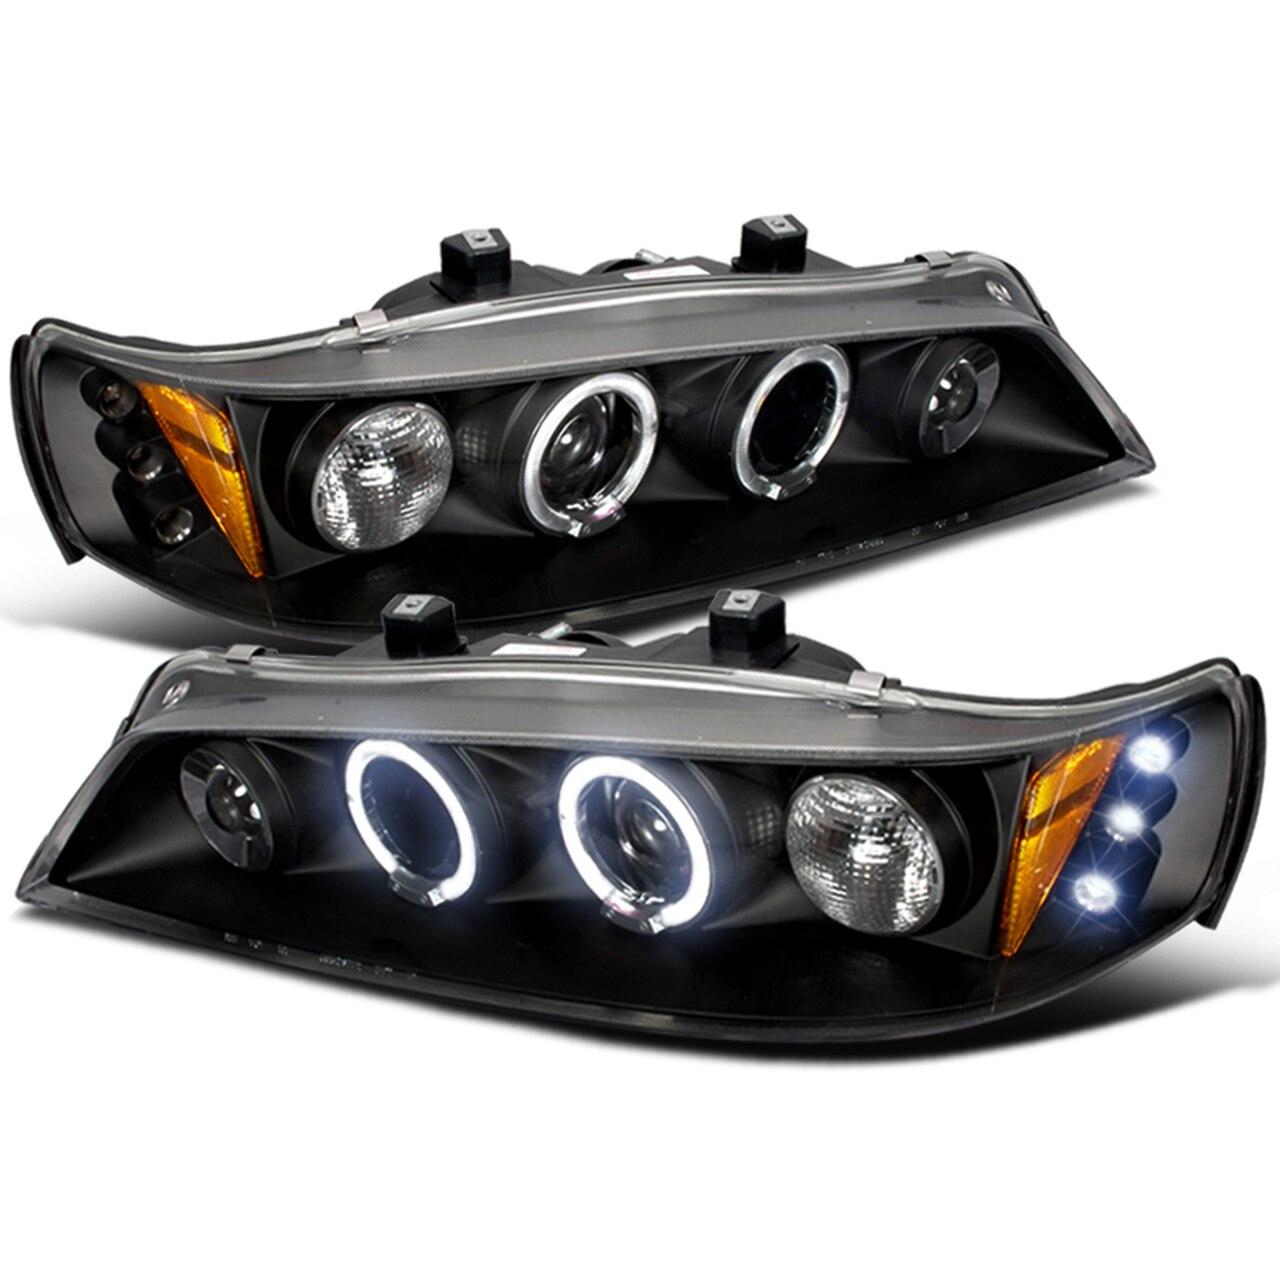 1994-1997 Honda Accord Dual Halo LED Projector Headlights (Matte Black Housing/Clear Lens)